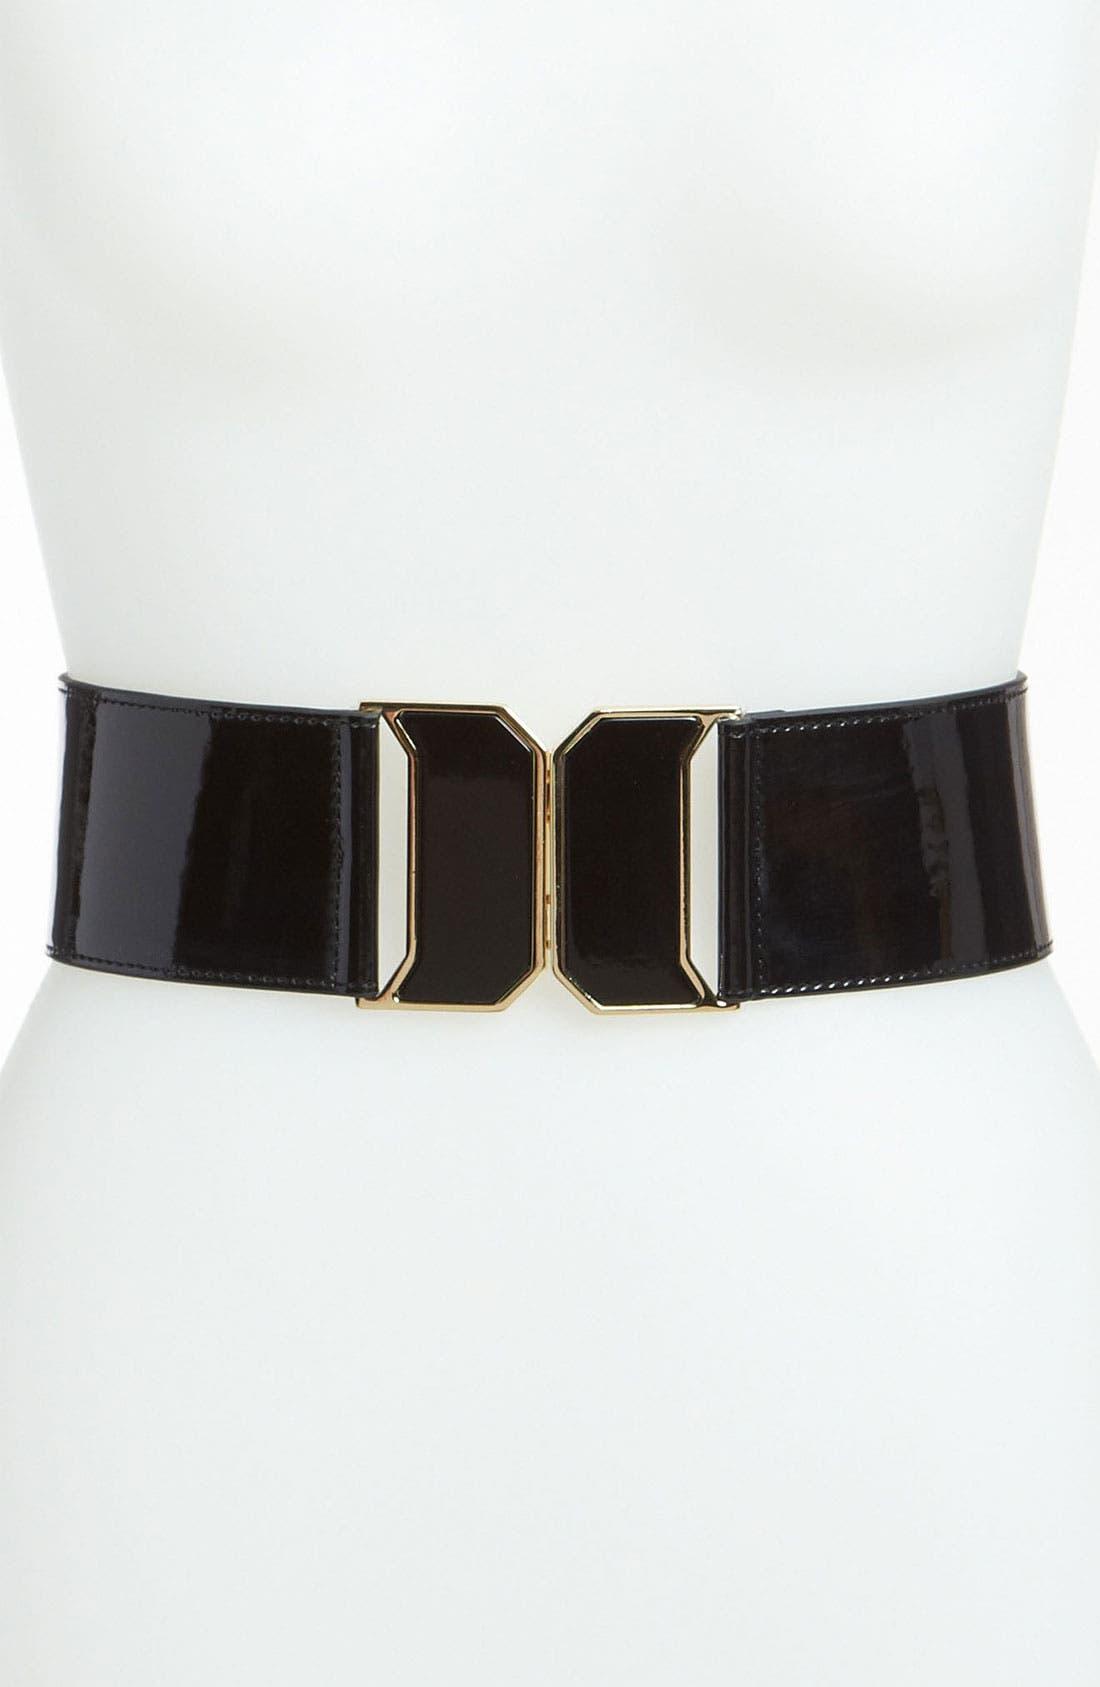 Main Image - Betsey Johnson 'Vintage Deco' Stretch Belt